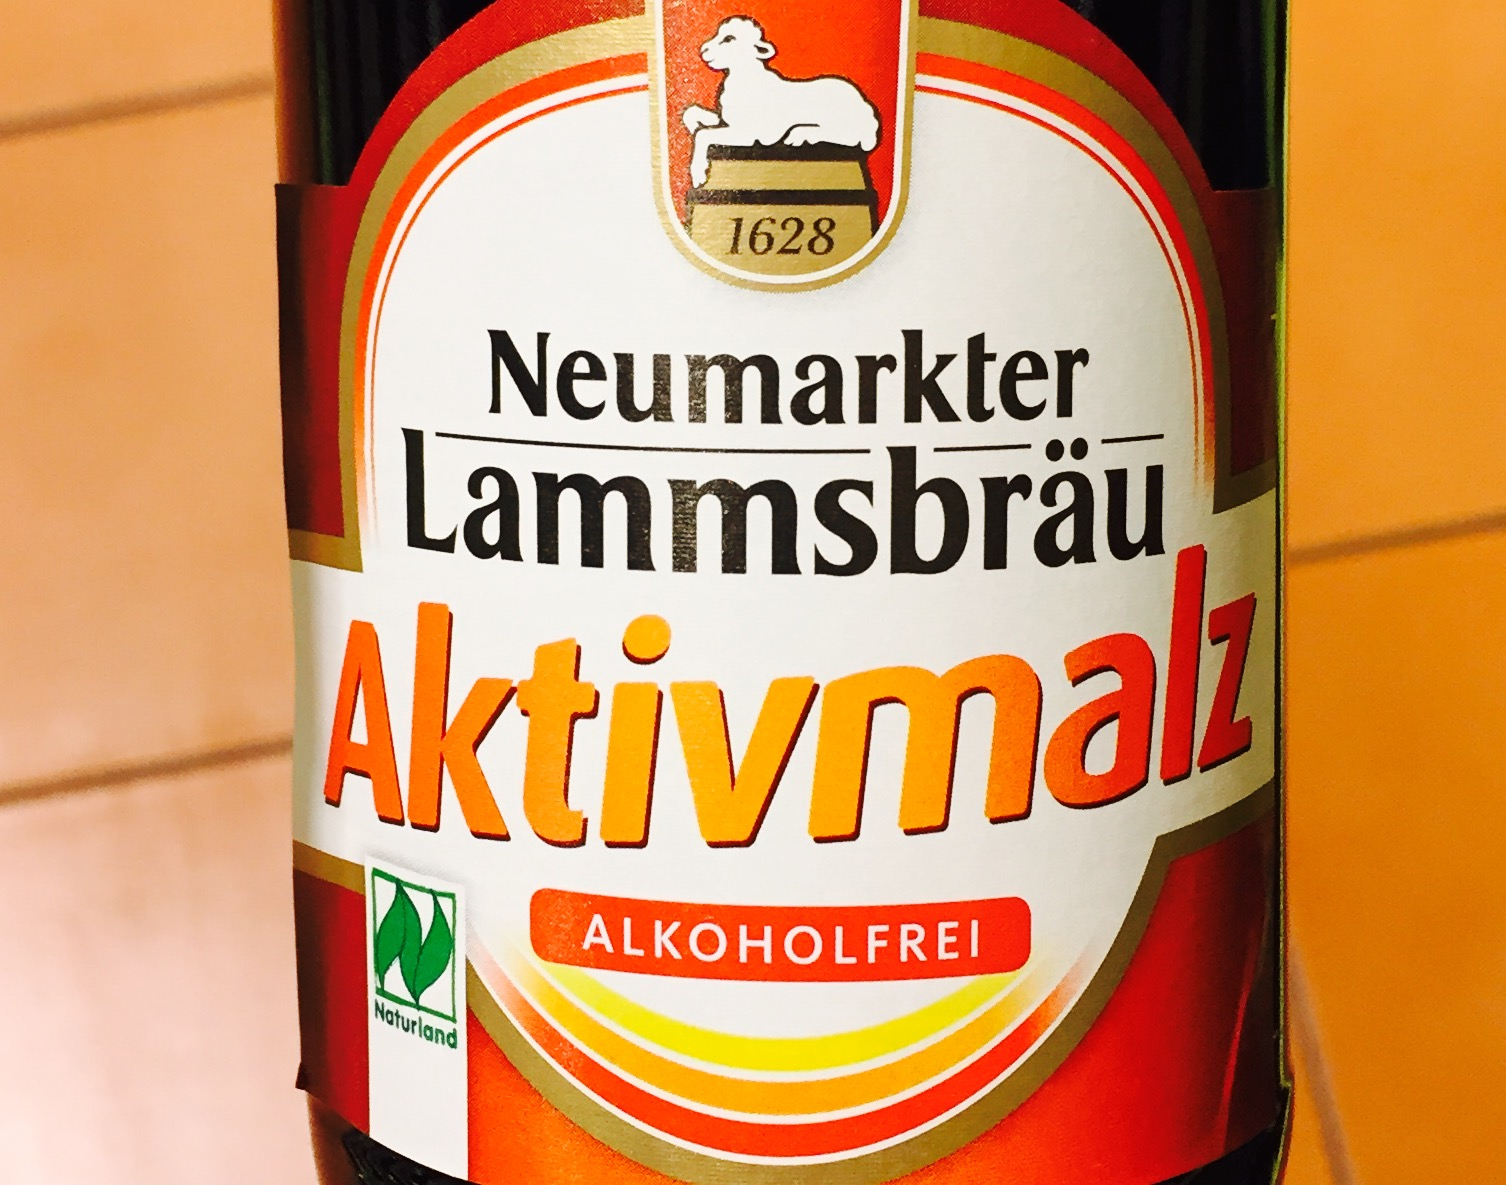 Neumarkter Lammsbräu - Aktivmalz Alkoholfrei